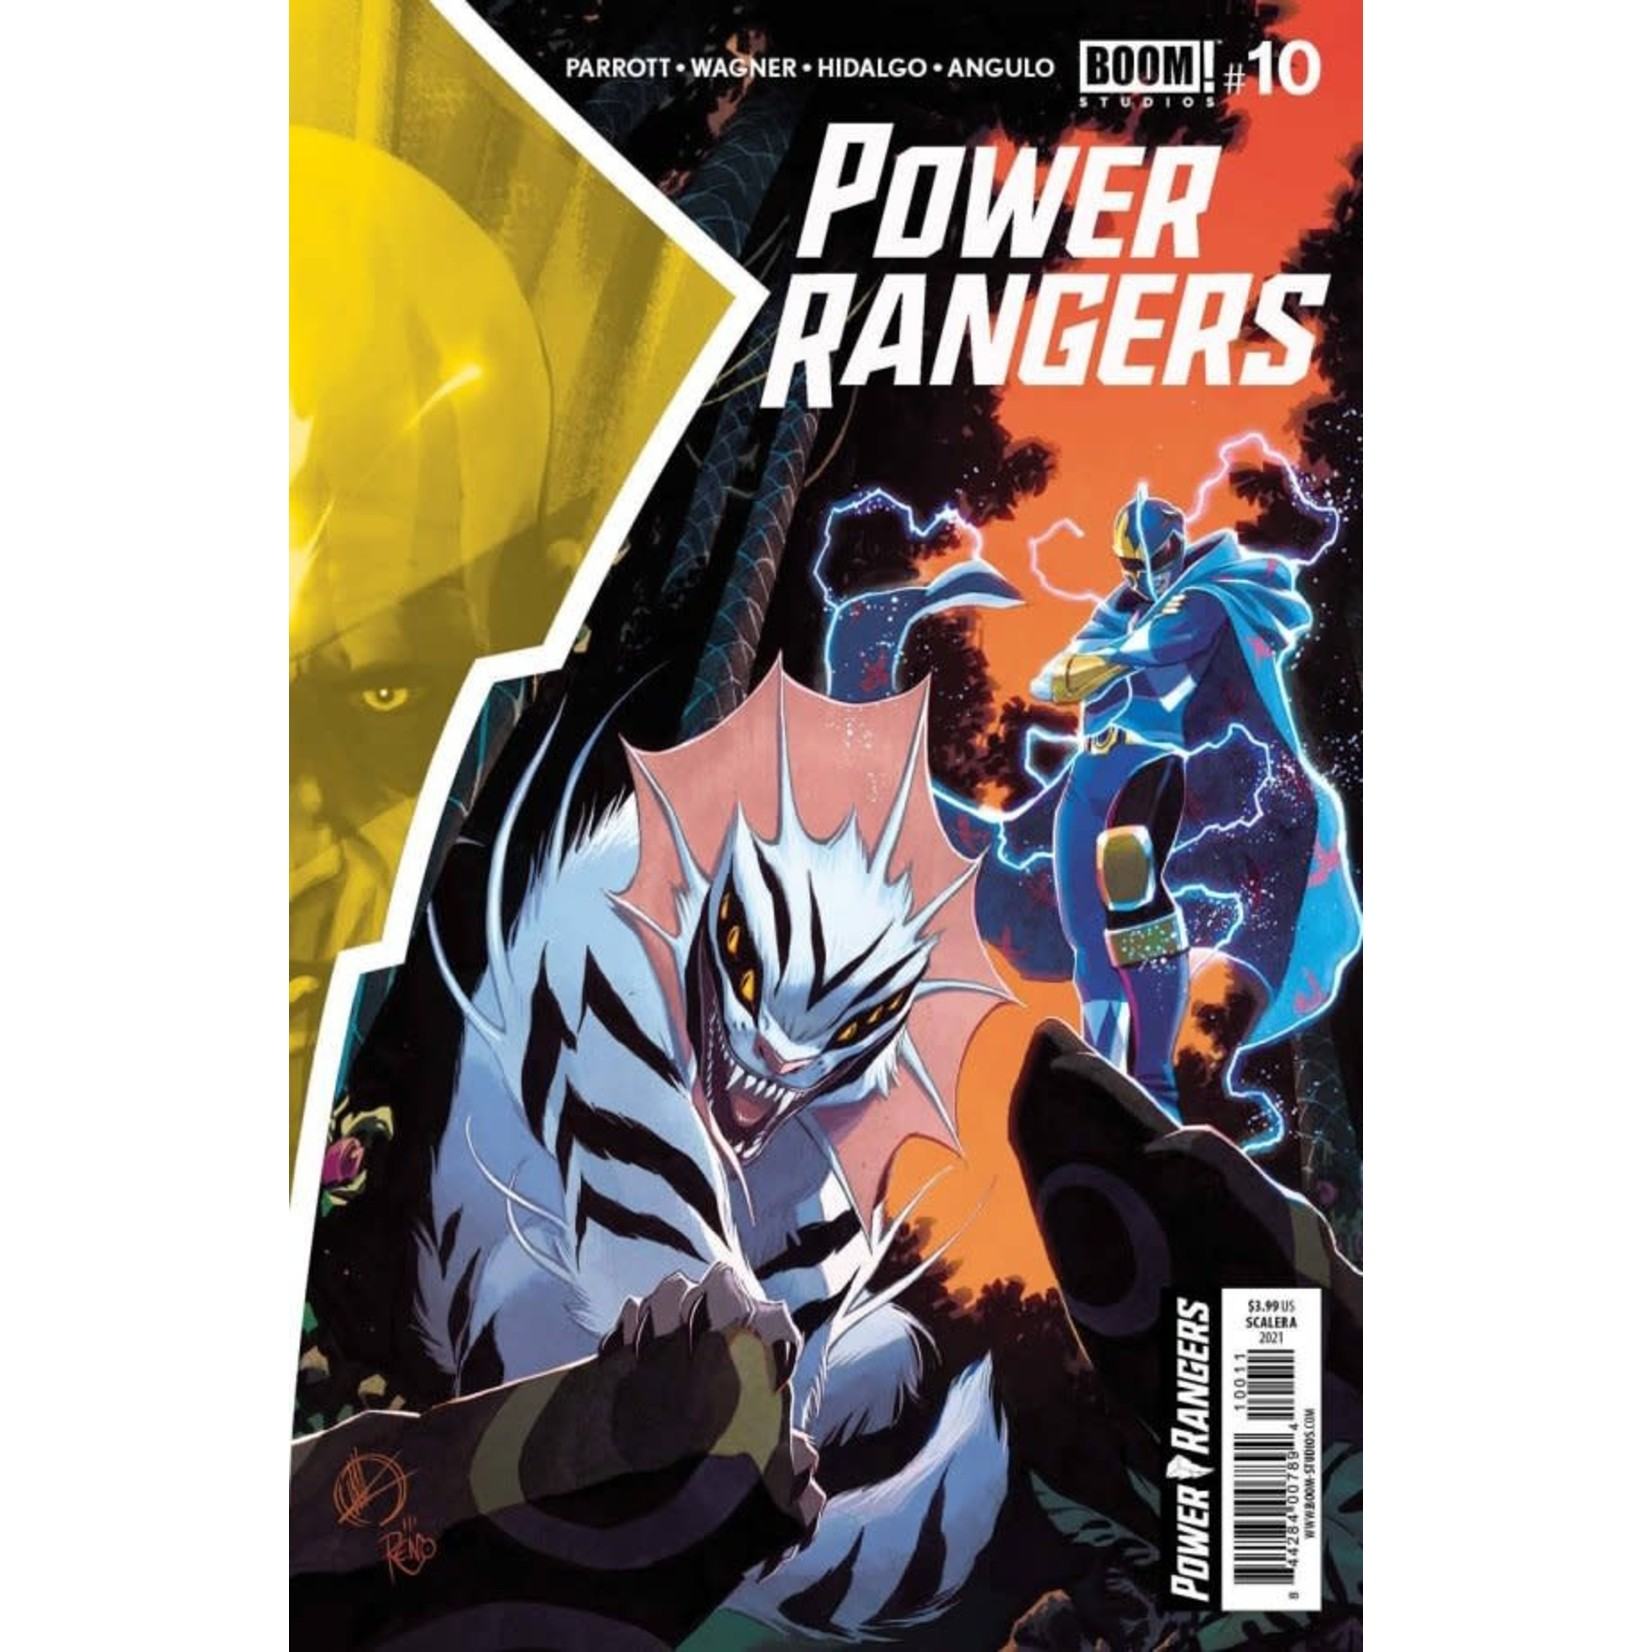 Boom Power Rangers #10